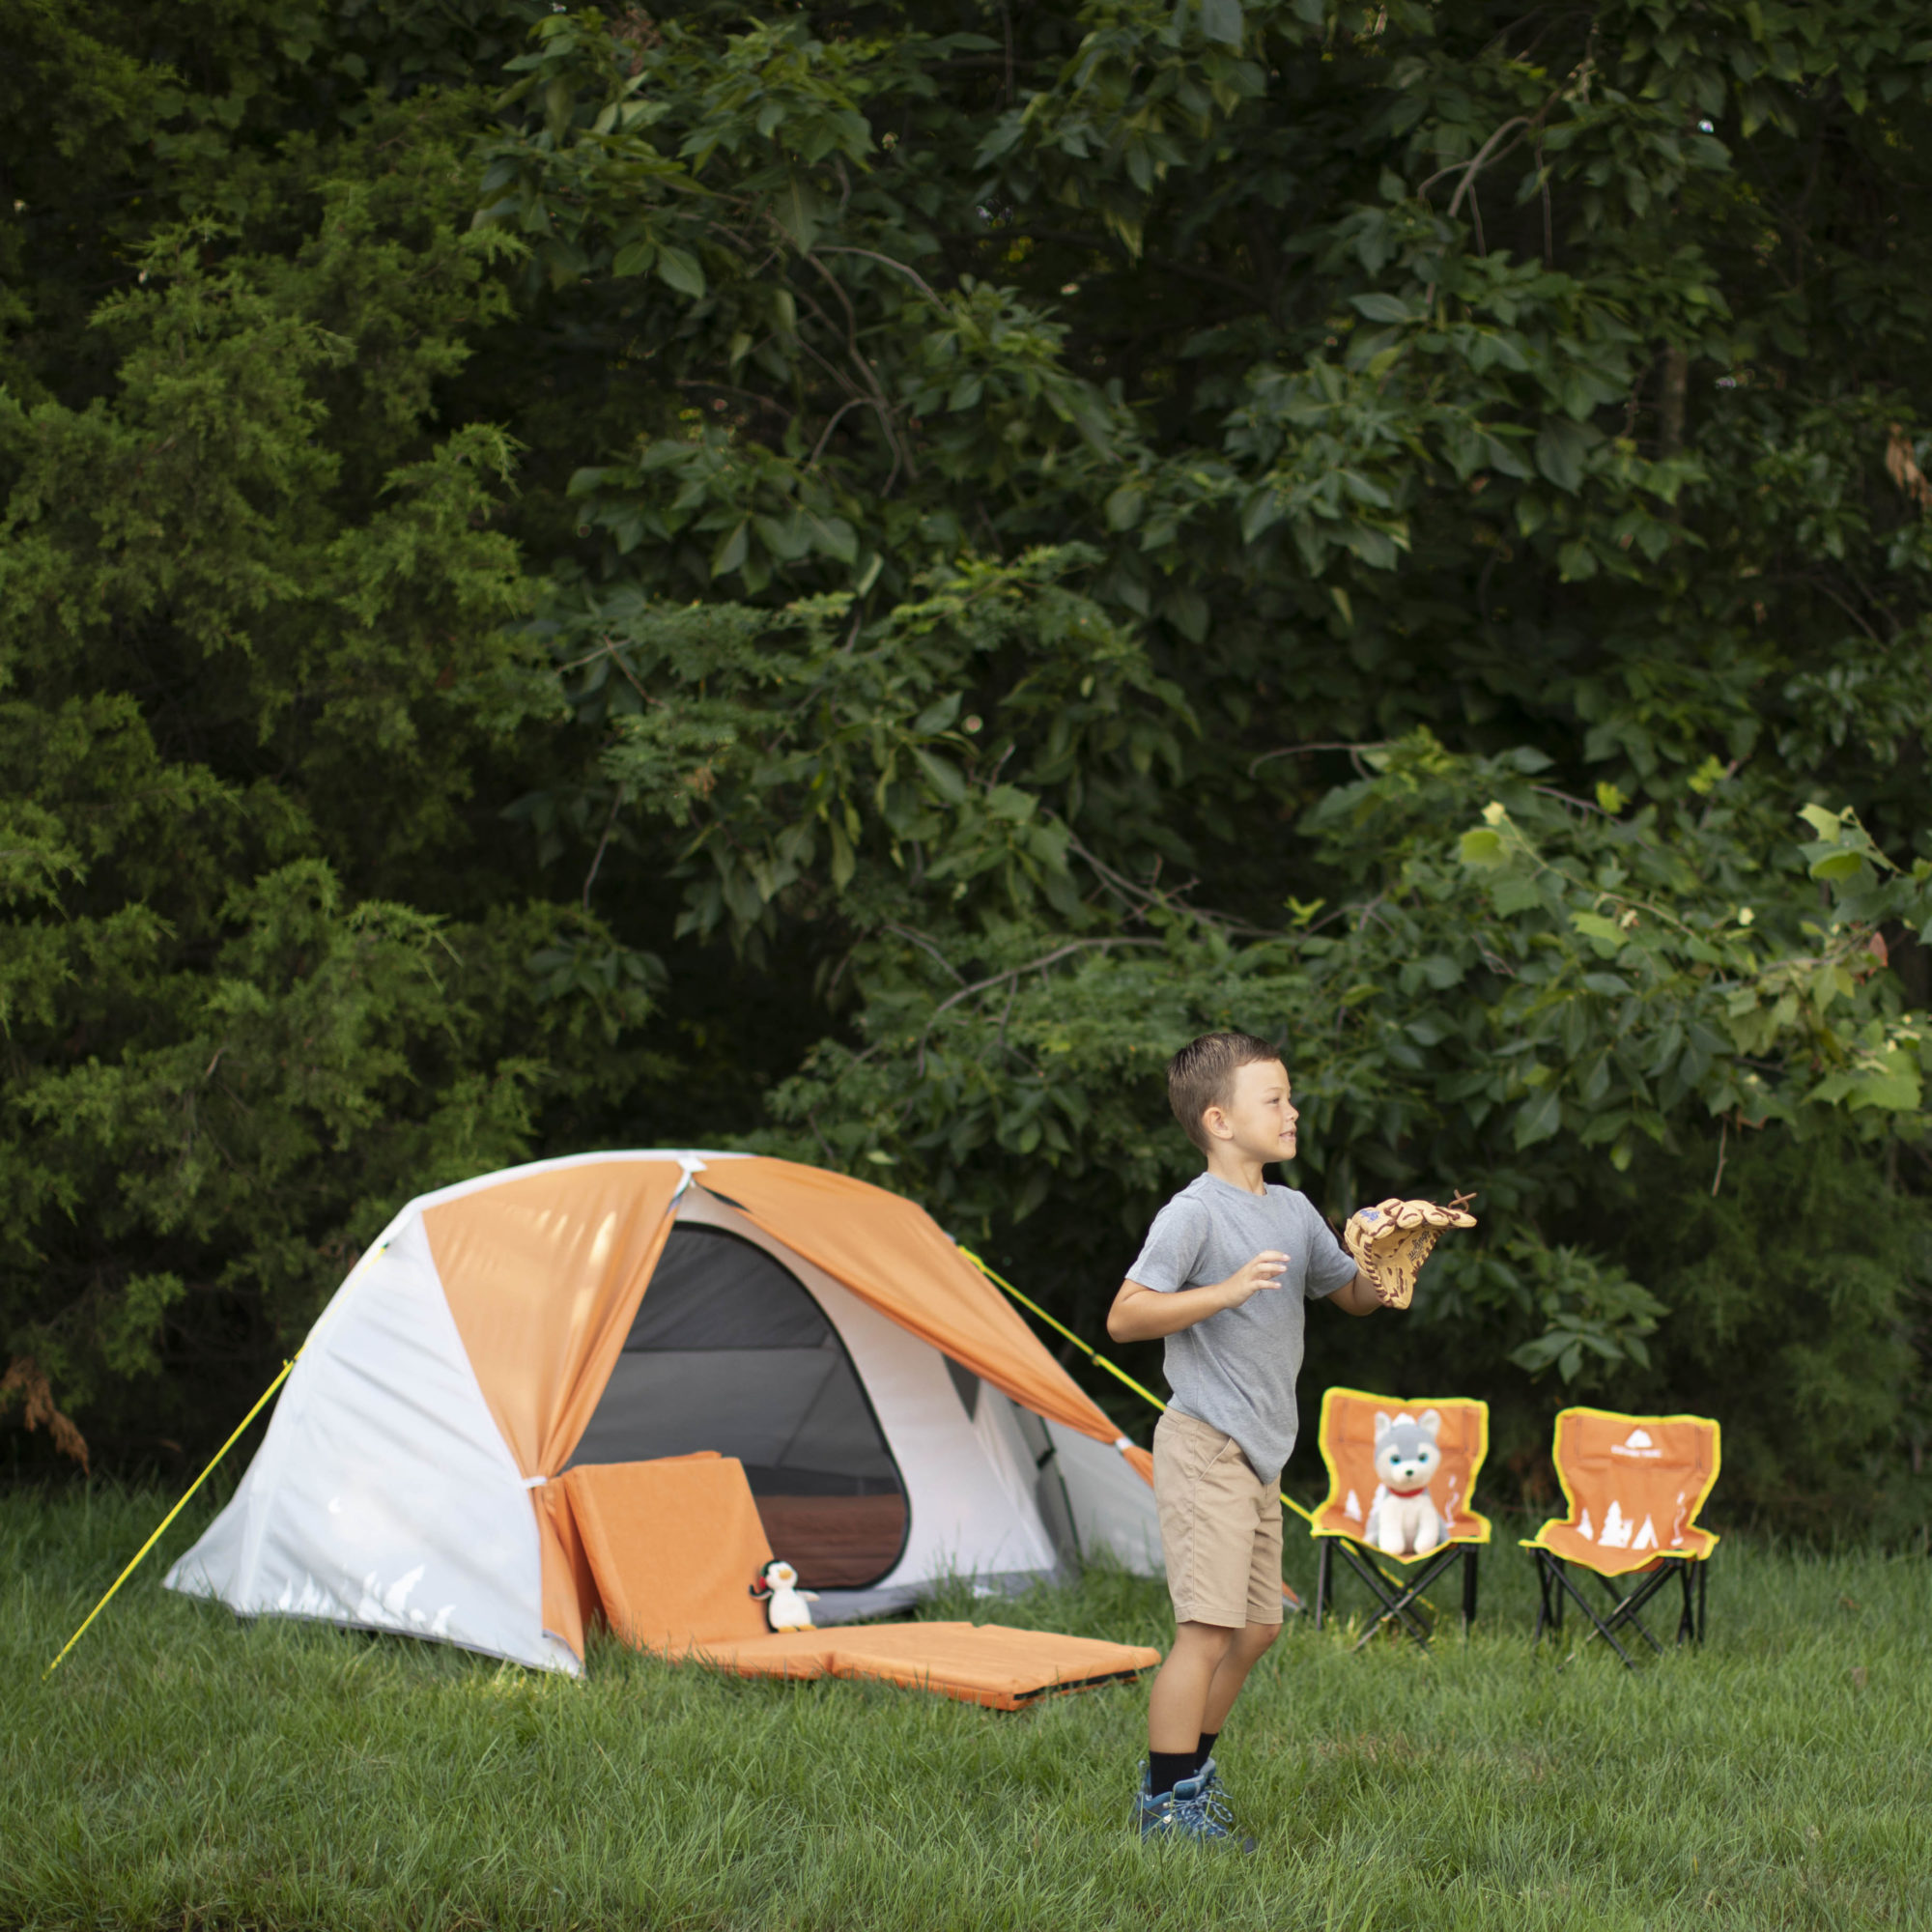 Ozark Trail 3-Person Kids Camping Tent Bundle Only $29 at Walmart (Reg $119)